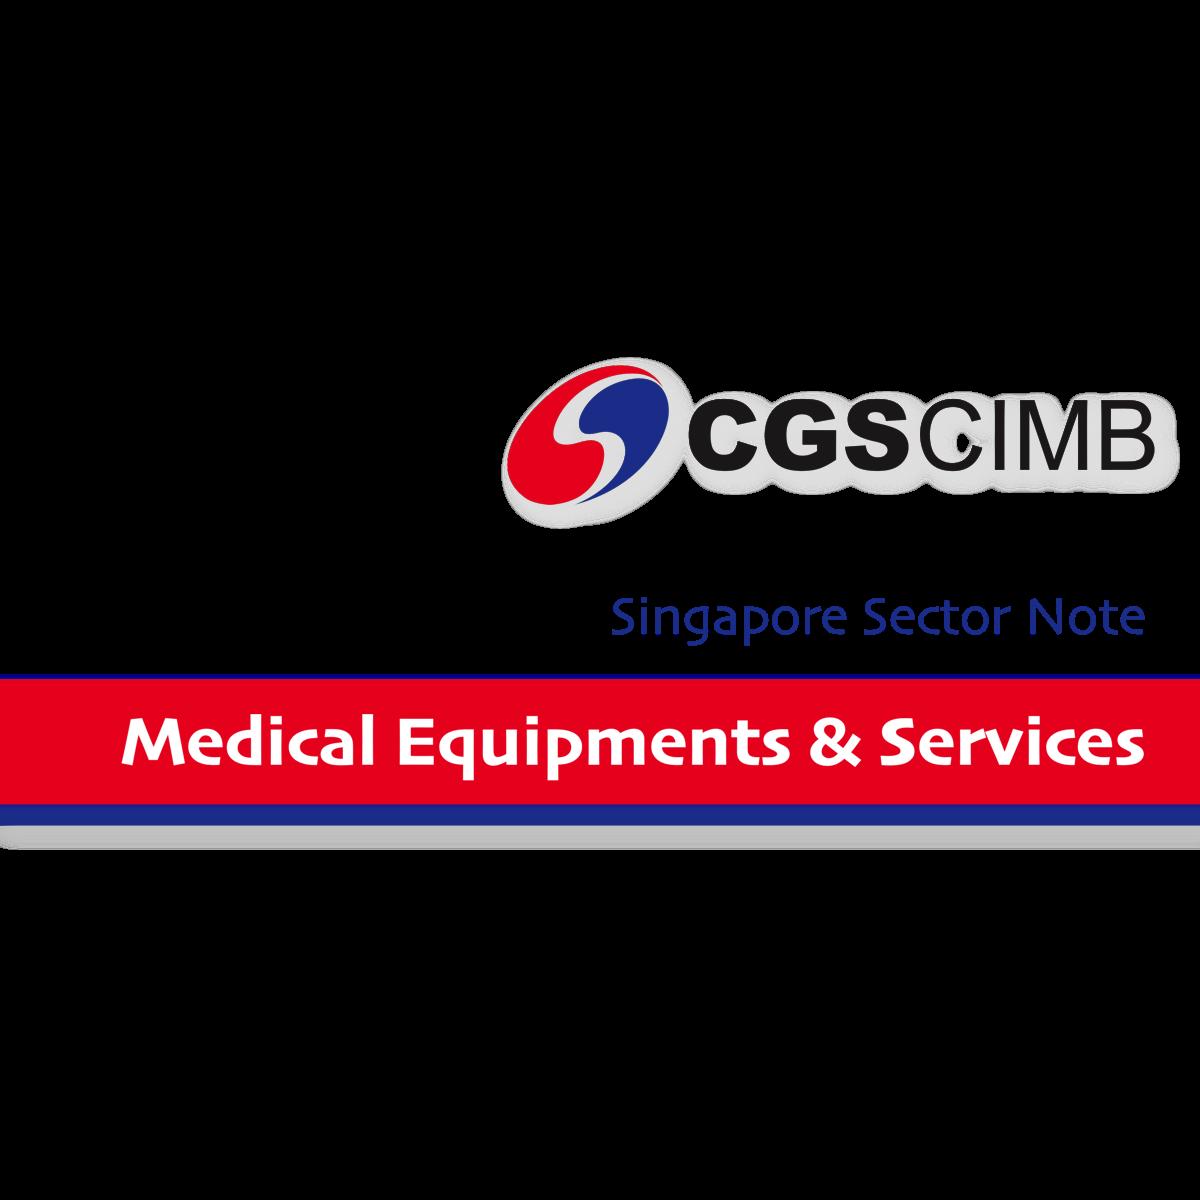 Singapore Medical Equipment & Services Companies - CGS-CIMB Research | SGinvestors.io